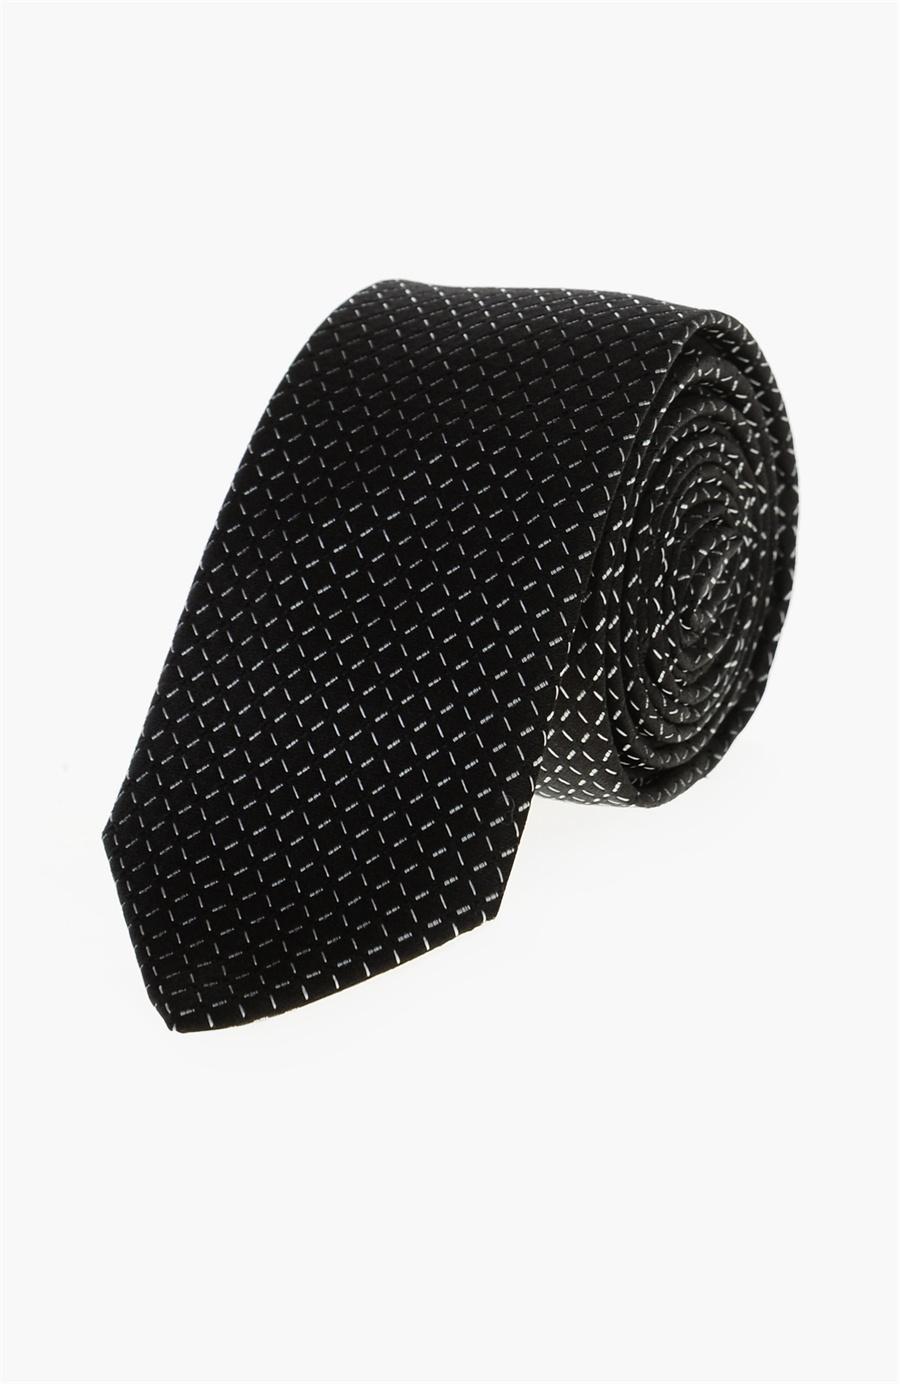 Siyah beyaz desenli kravat